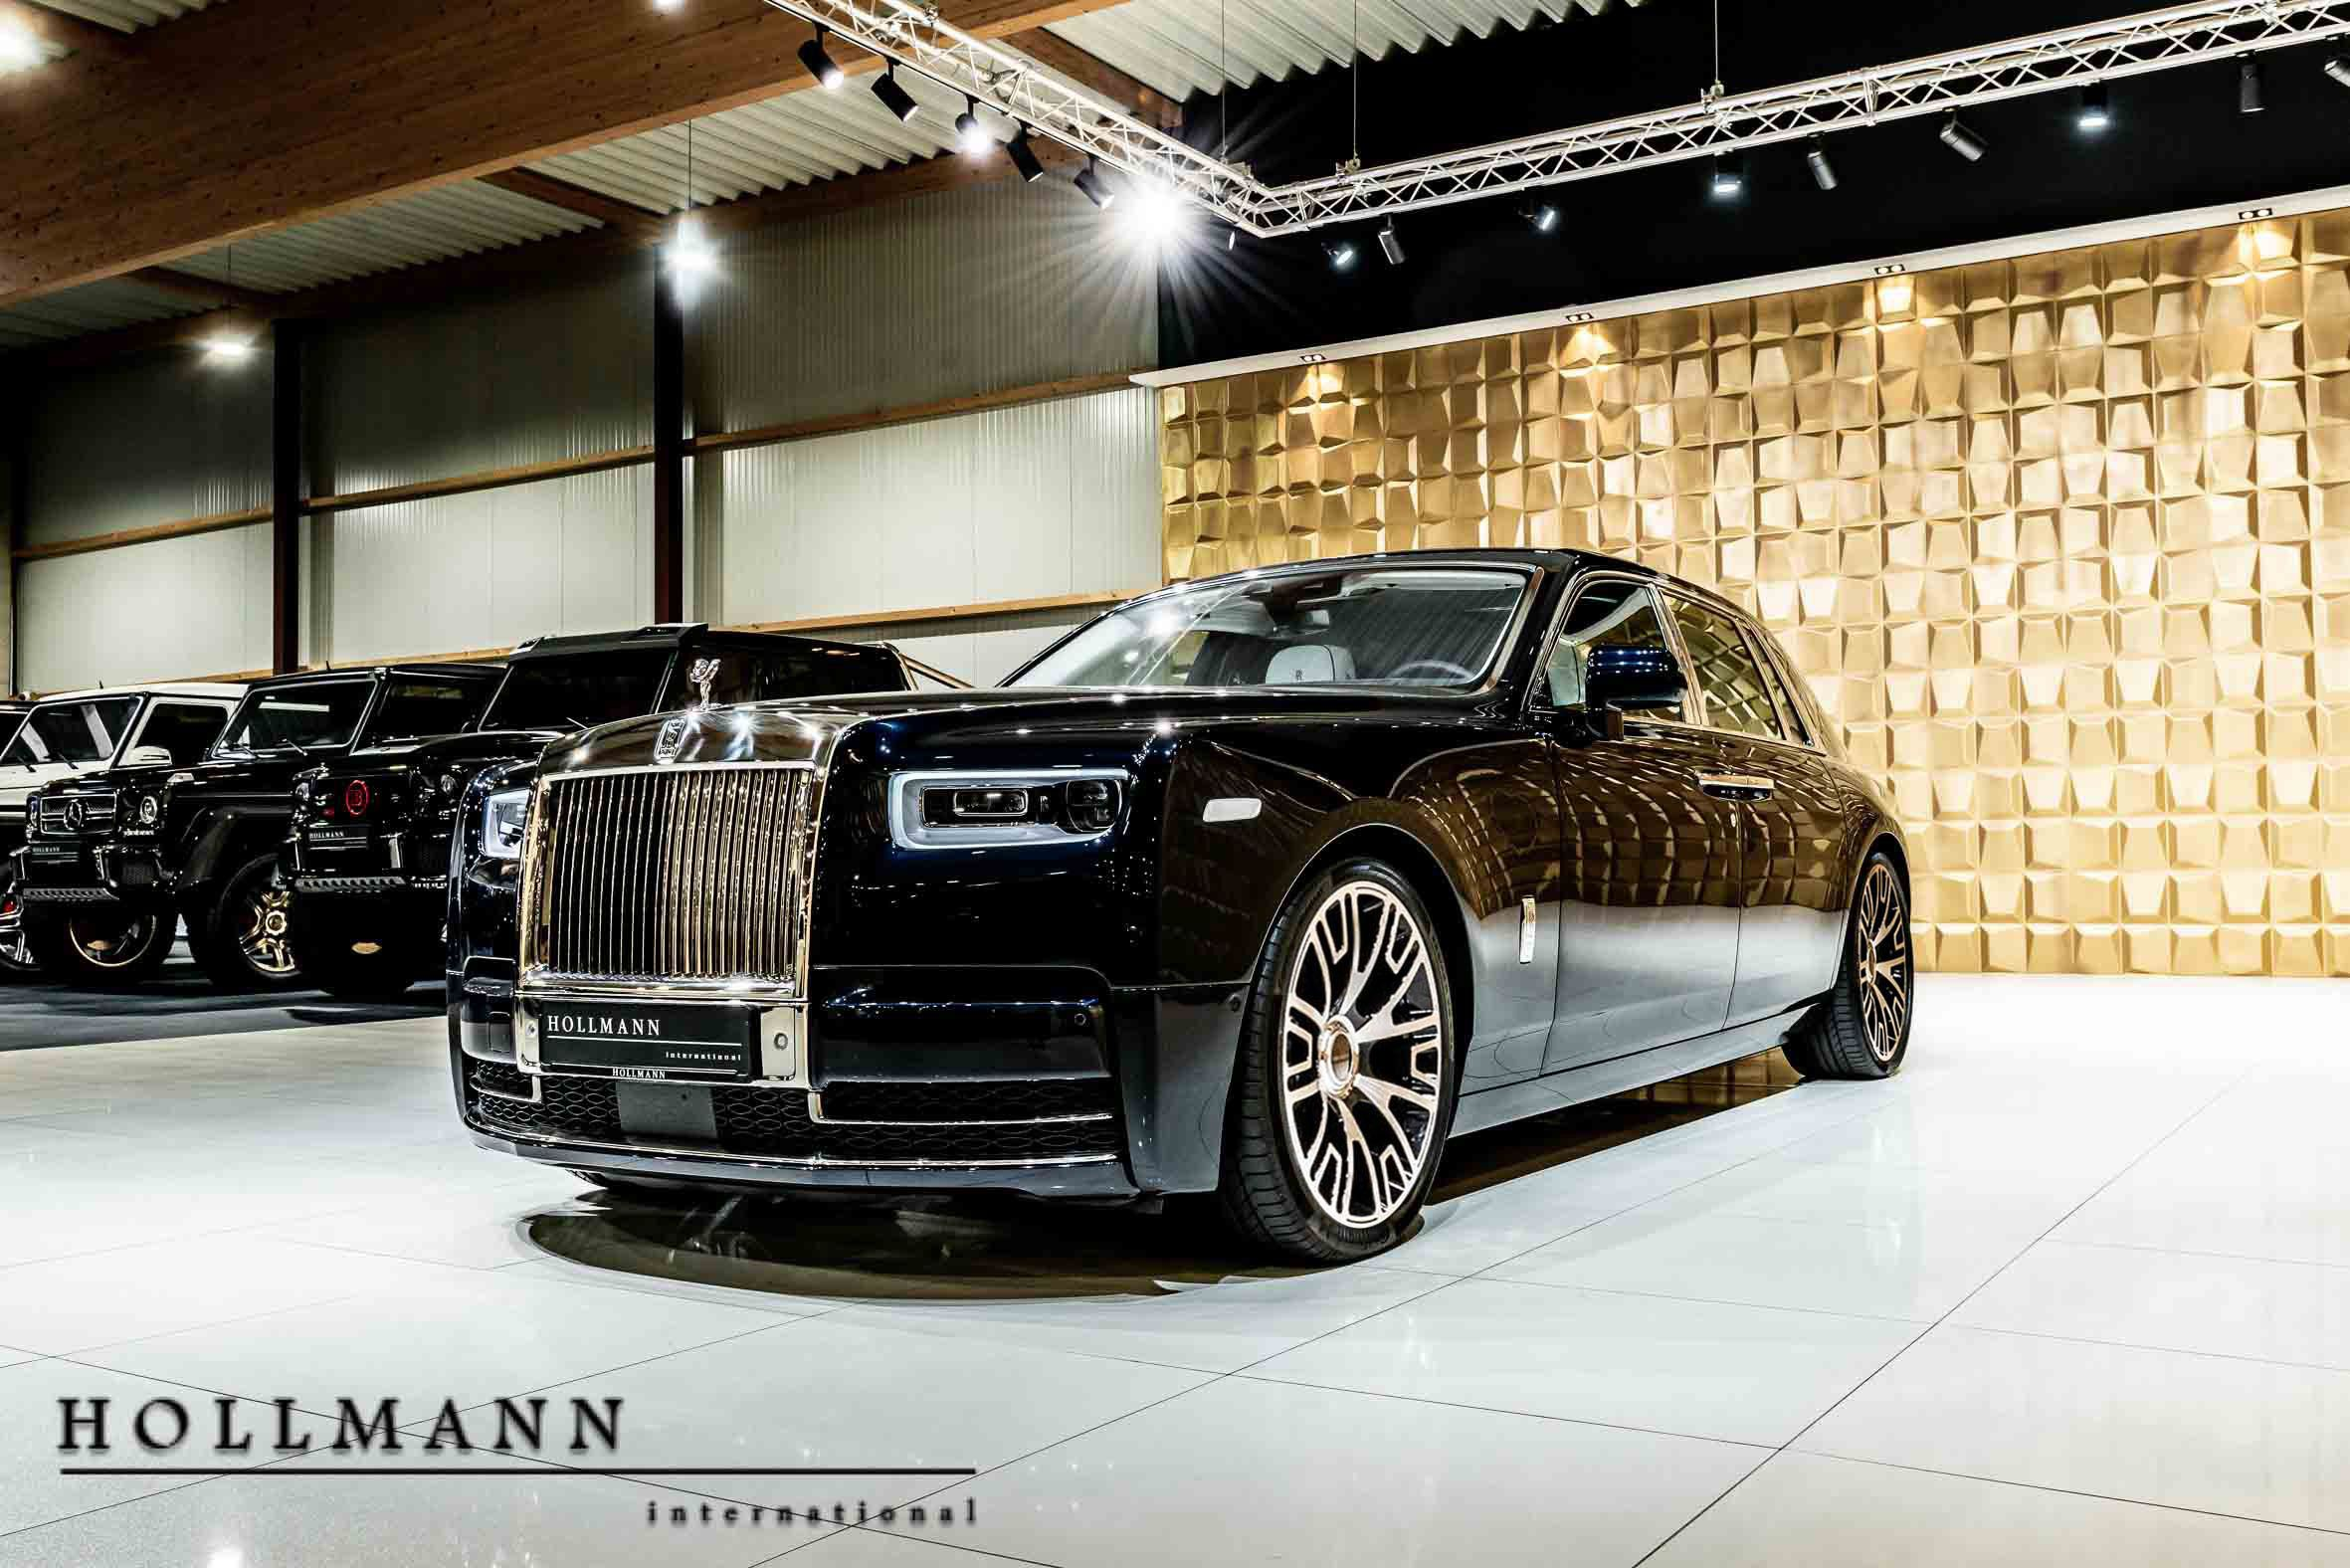 Rolls Royce Phantom Viii Luxury Pulse Cars Germany For Sale On Luxurypulse Rolls Royce Phantom Rolls Royce Limousine Interior